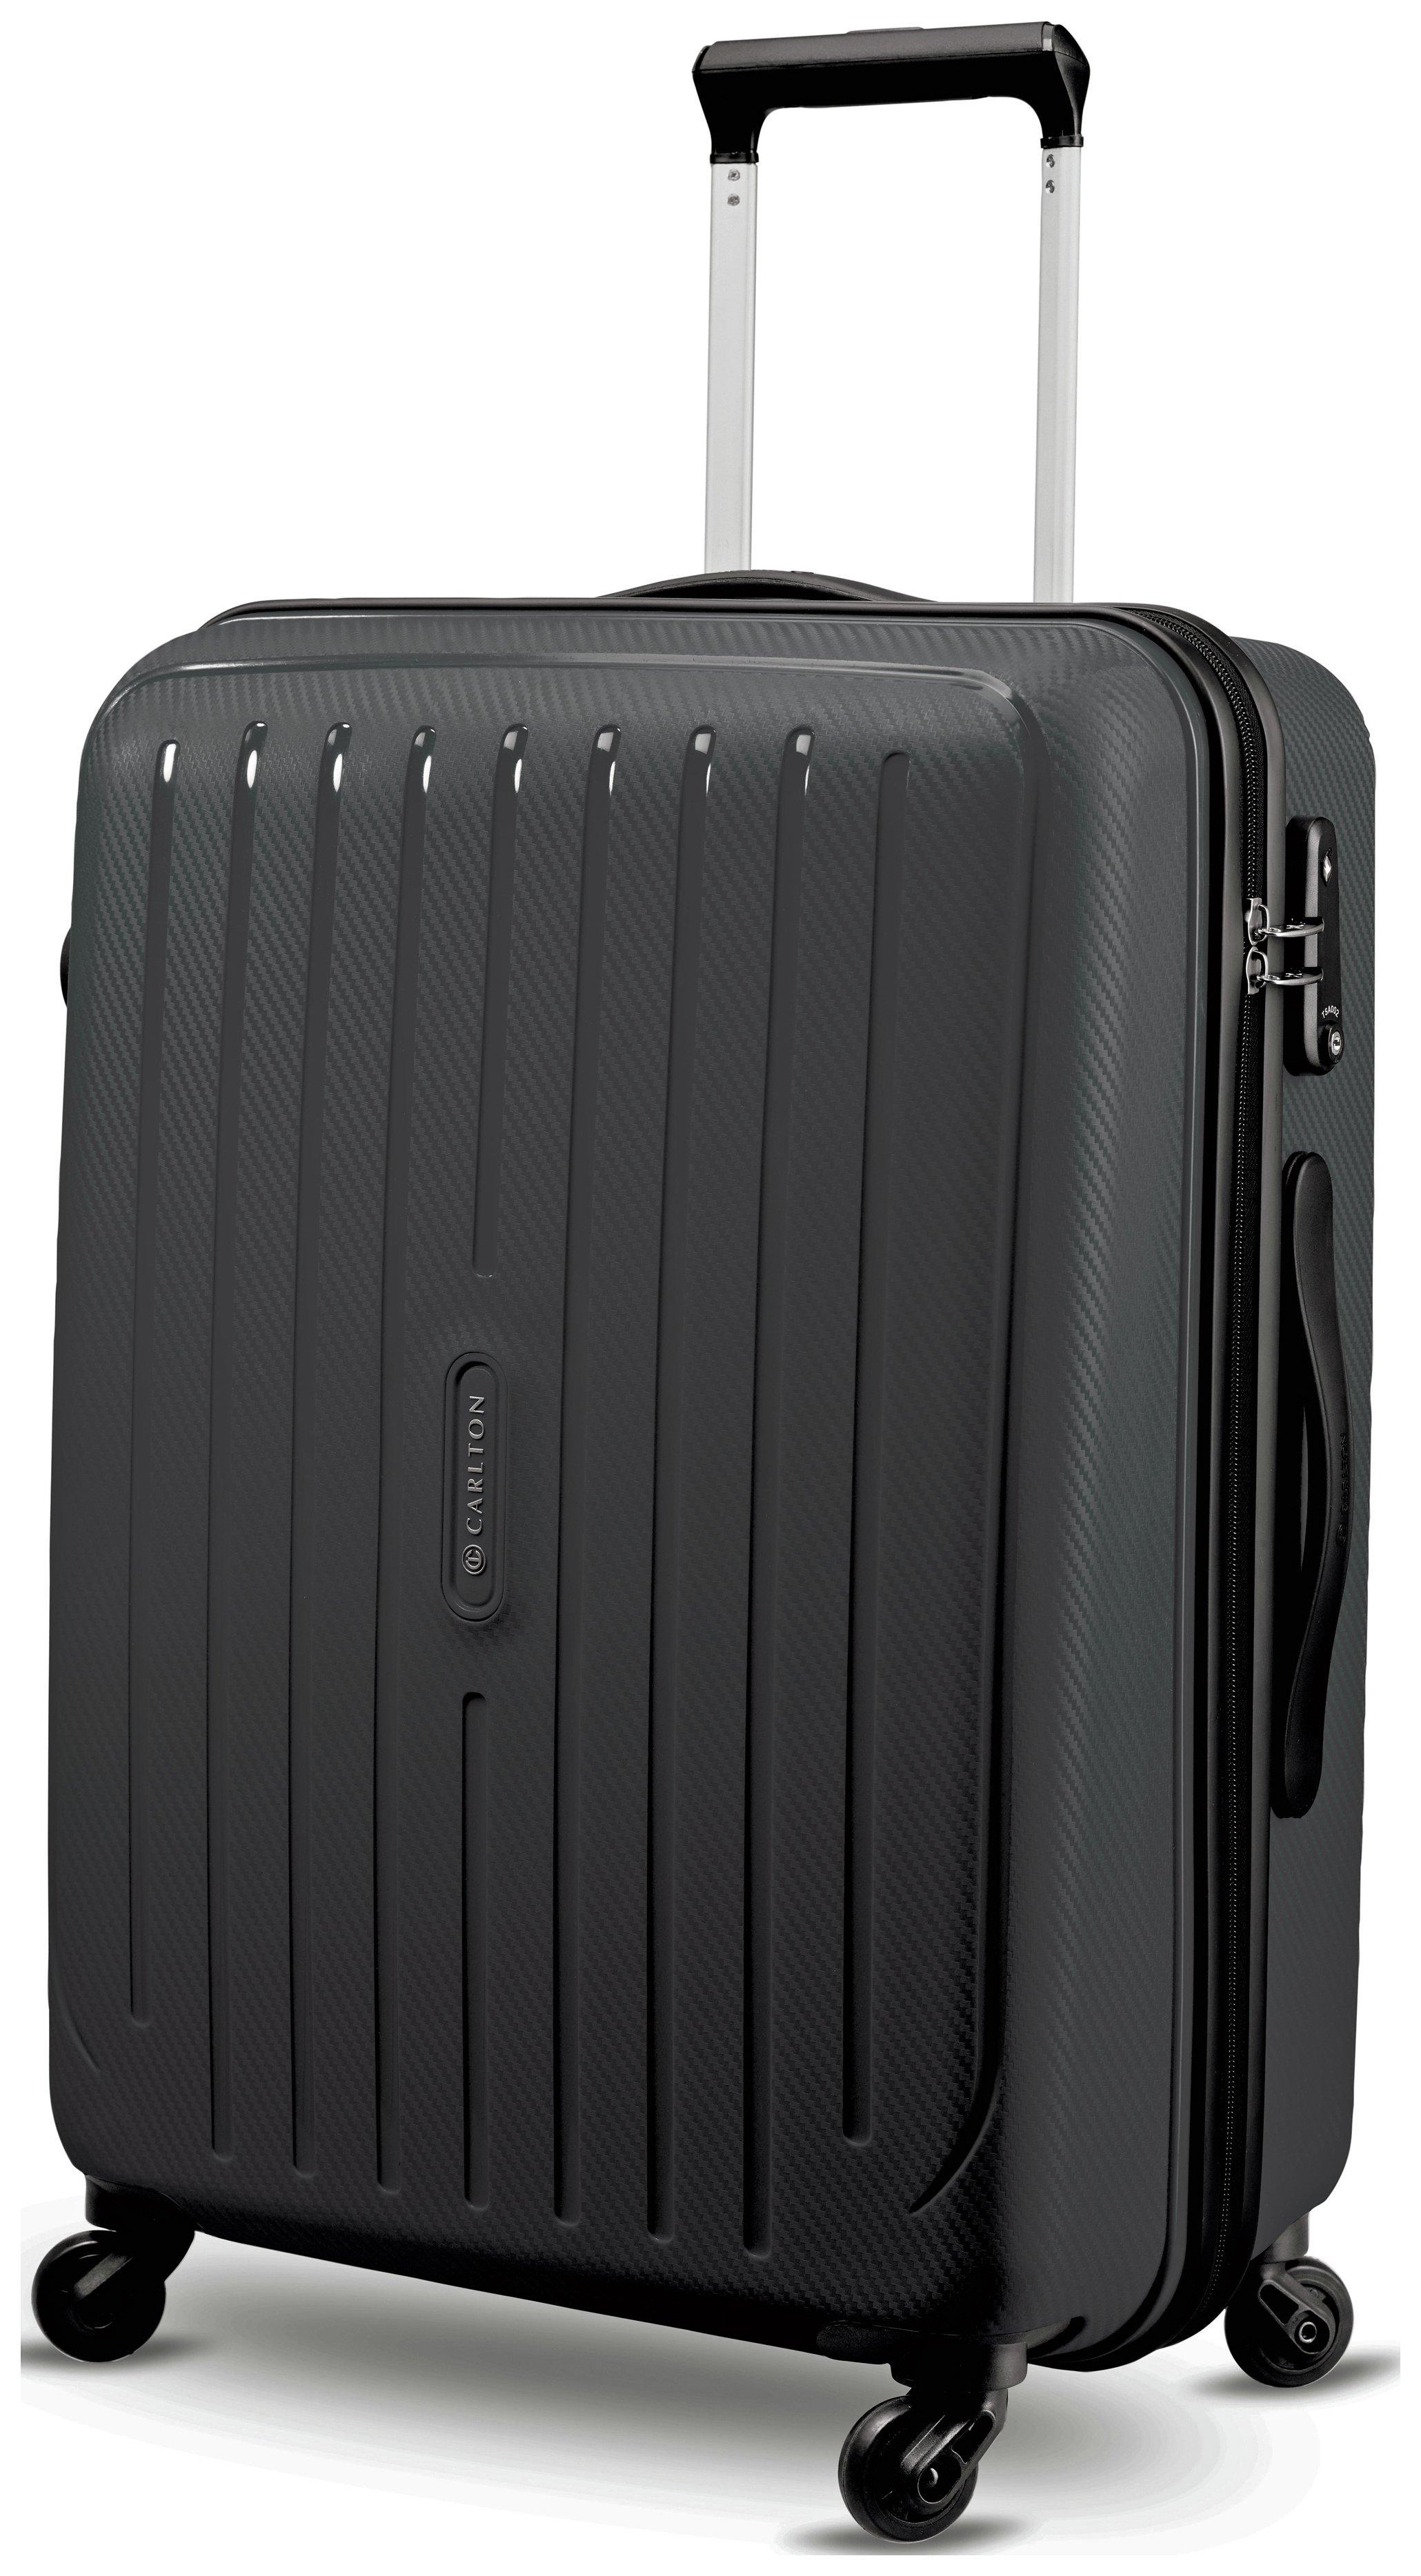 Image of Carlton - Pheonix Medium 4 Wheel Hard Suitcase - Black